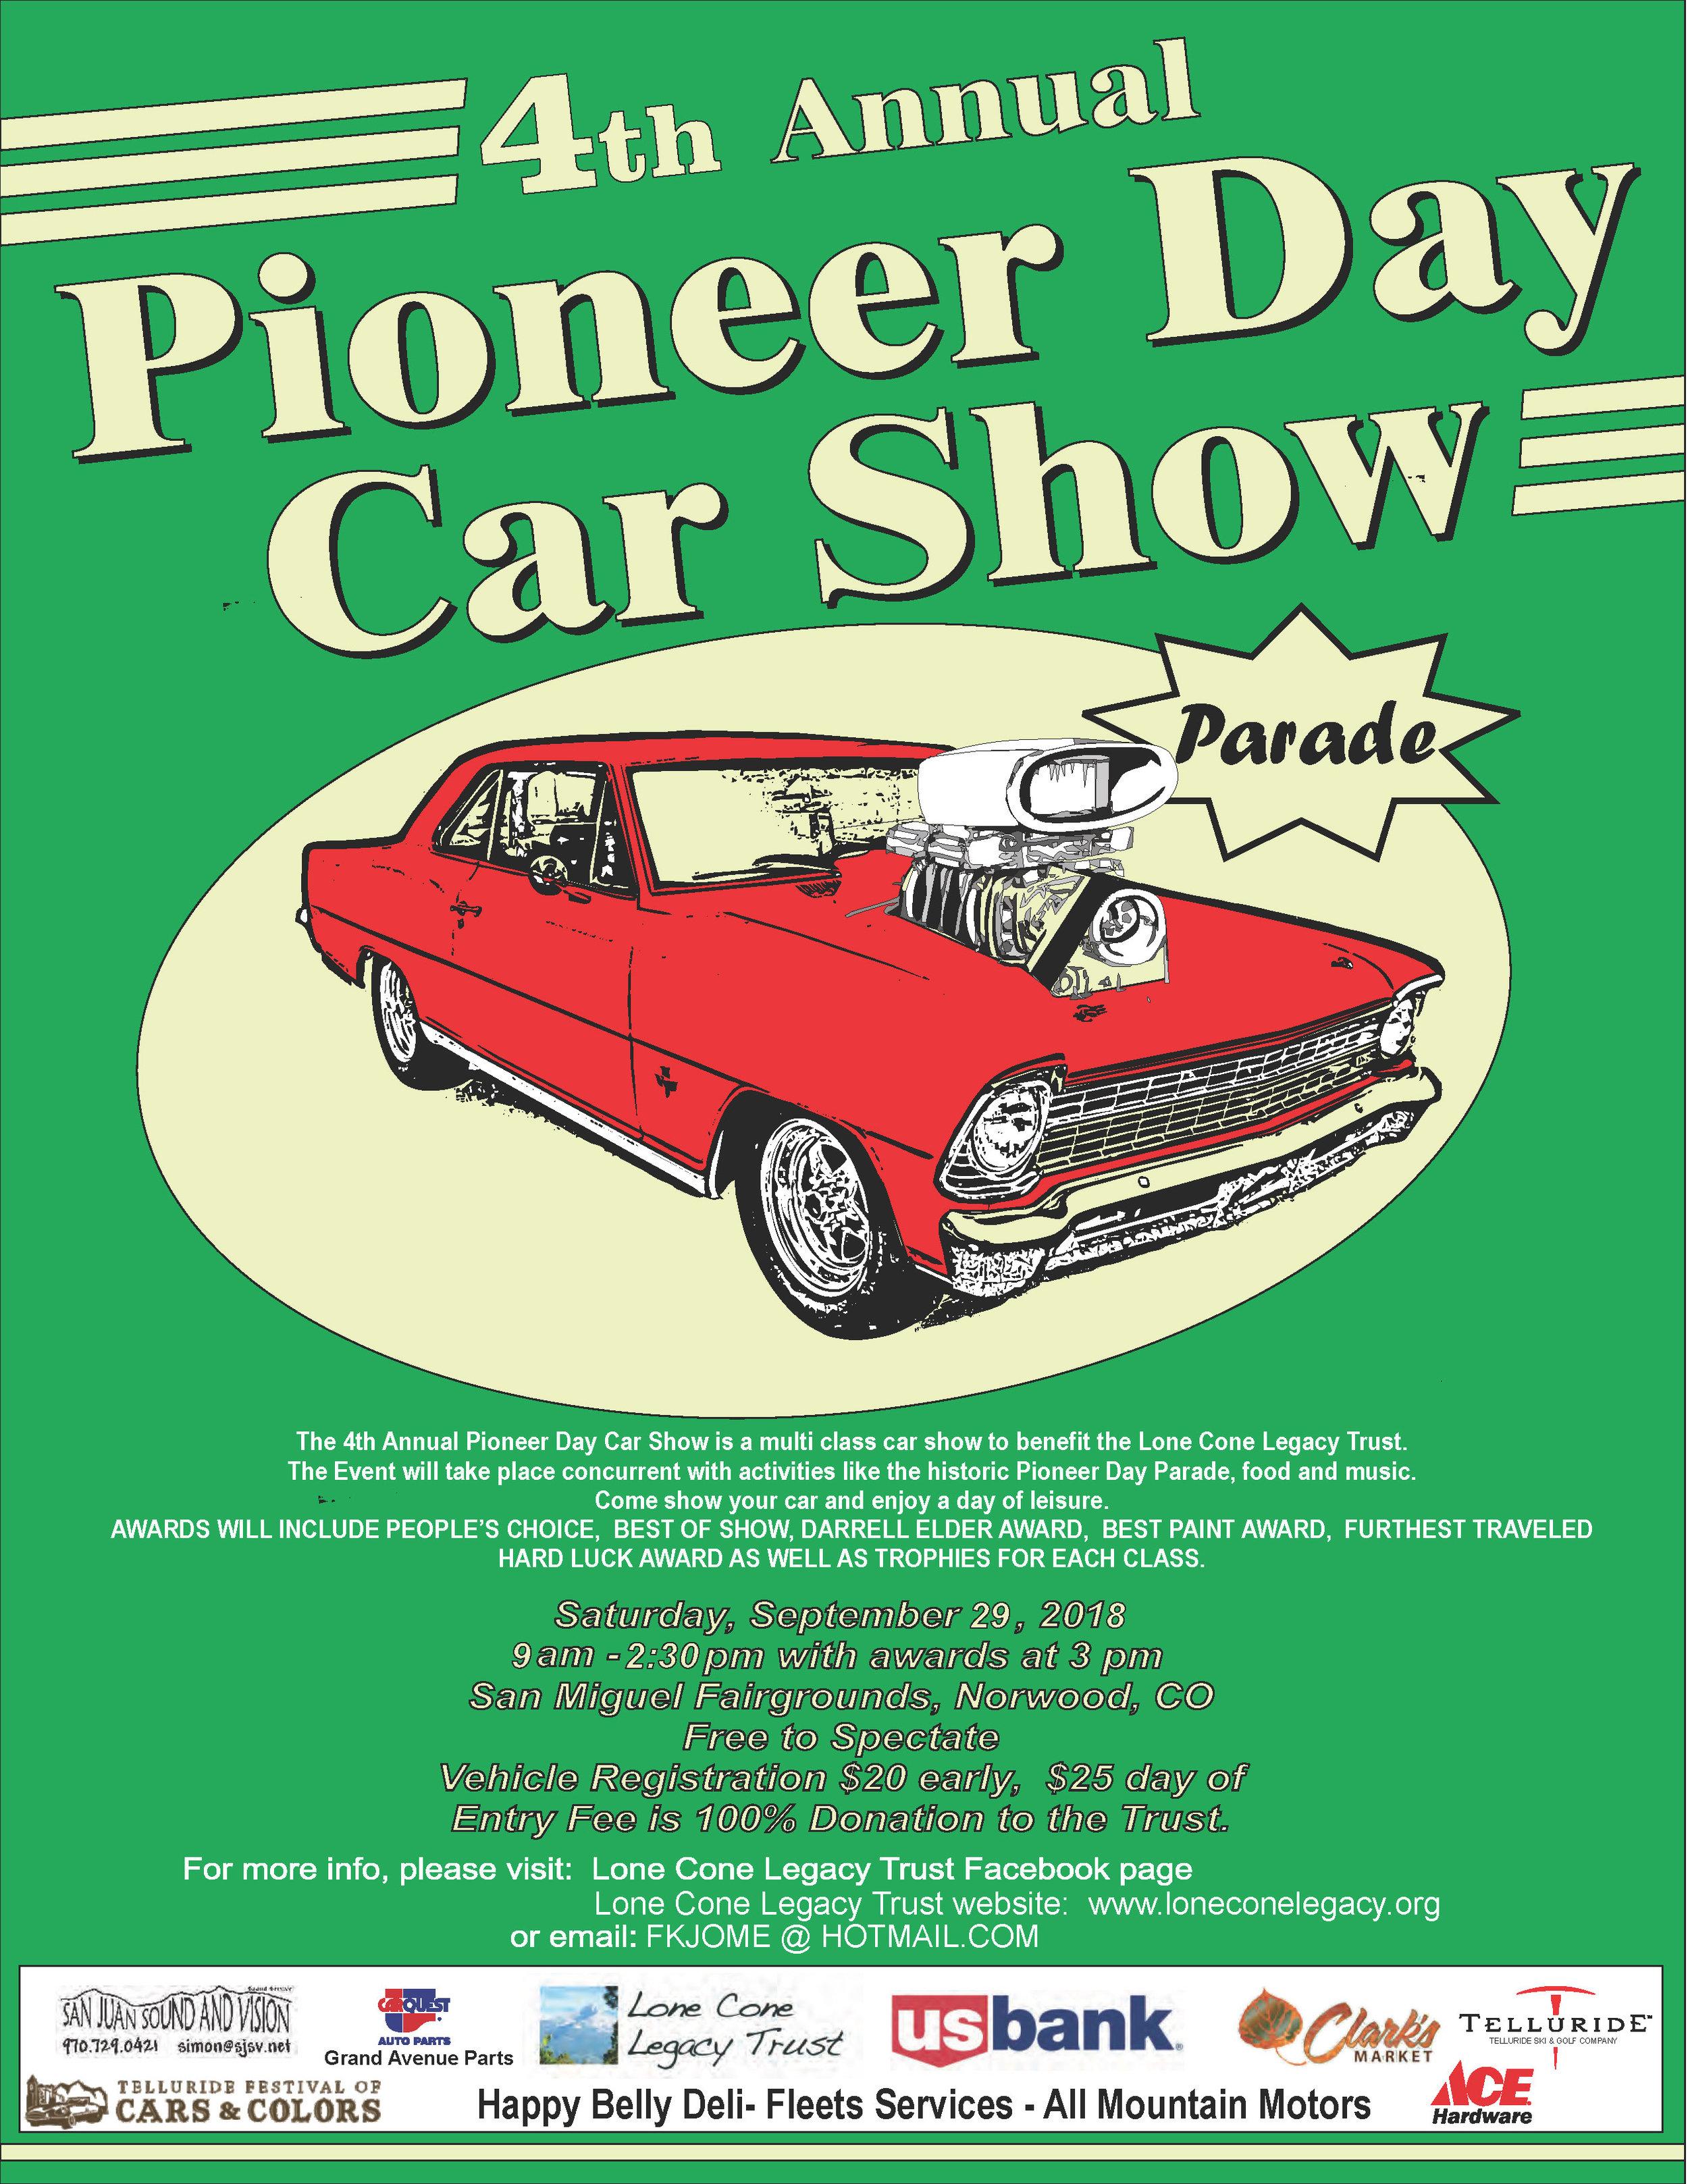 Lone Cone Legacy Trust 4th Annual Pioneer Day Car Show